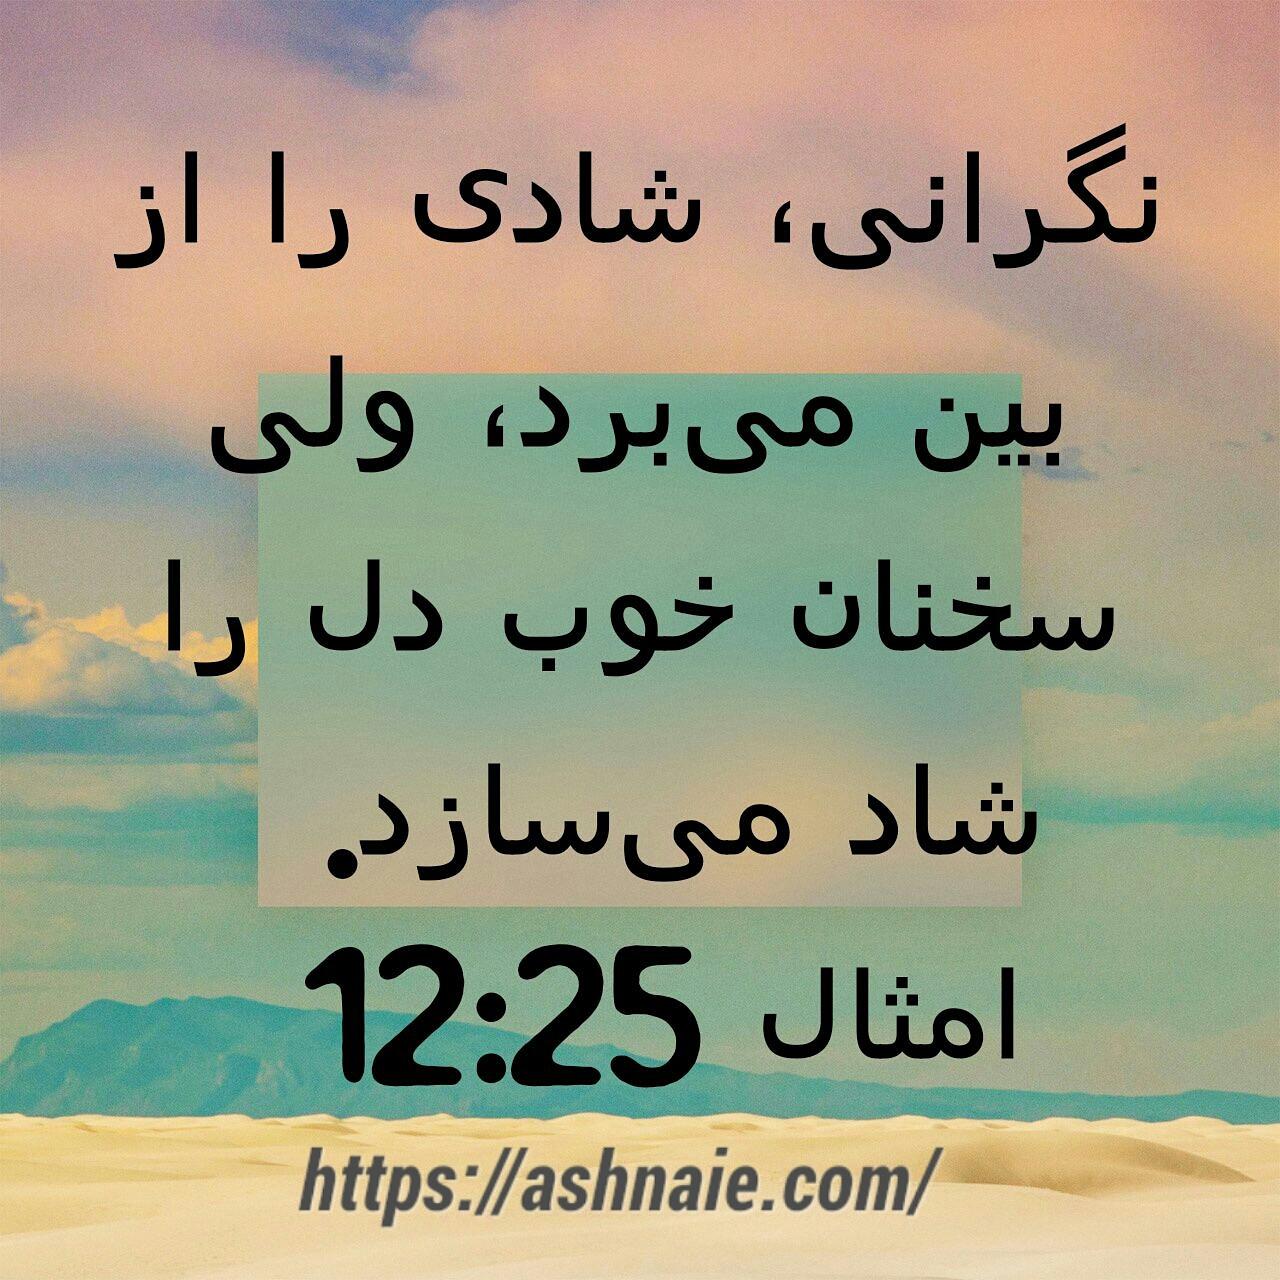 IMG_20181004_231232_579.jpg